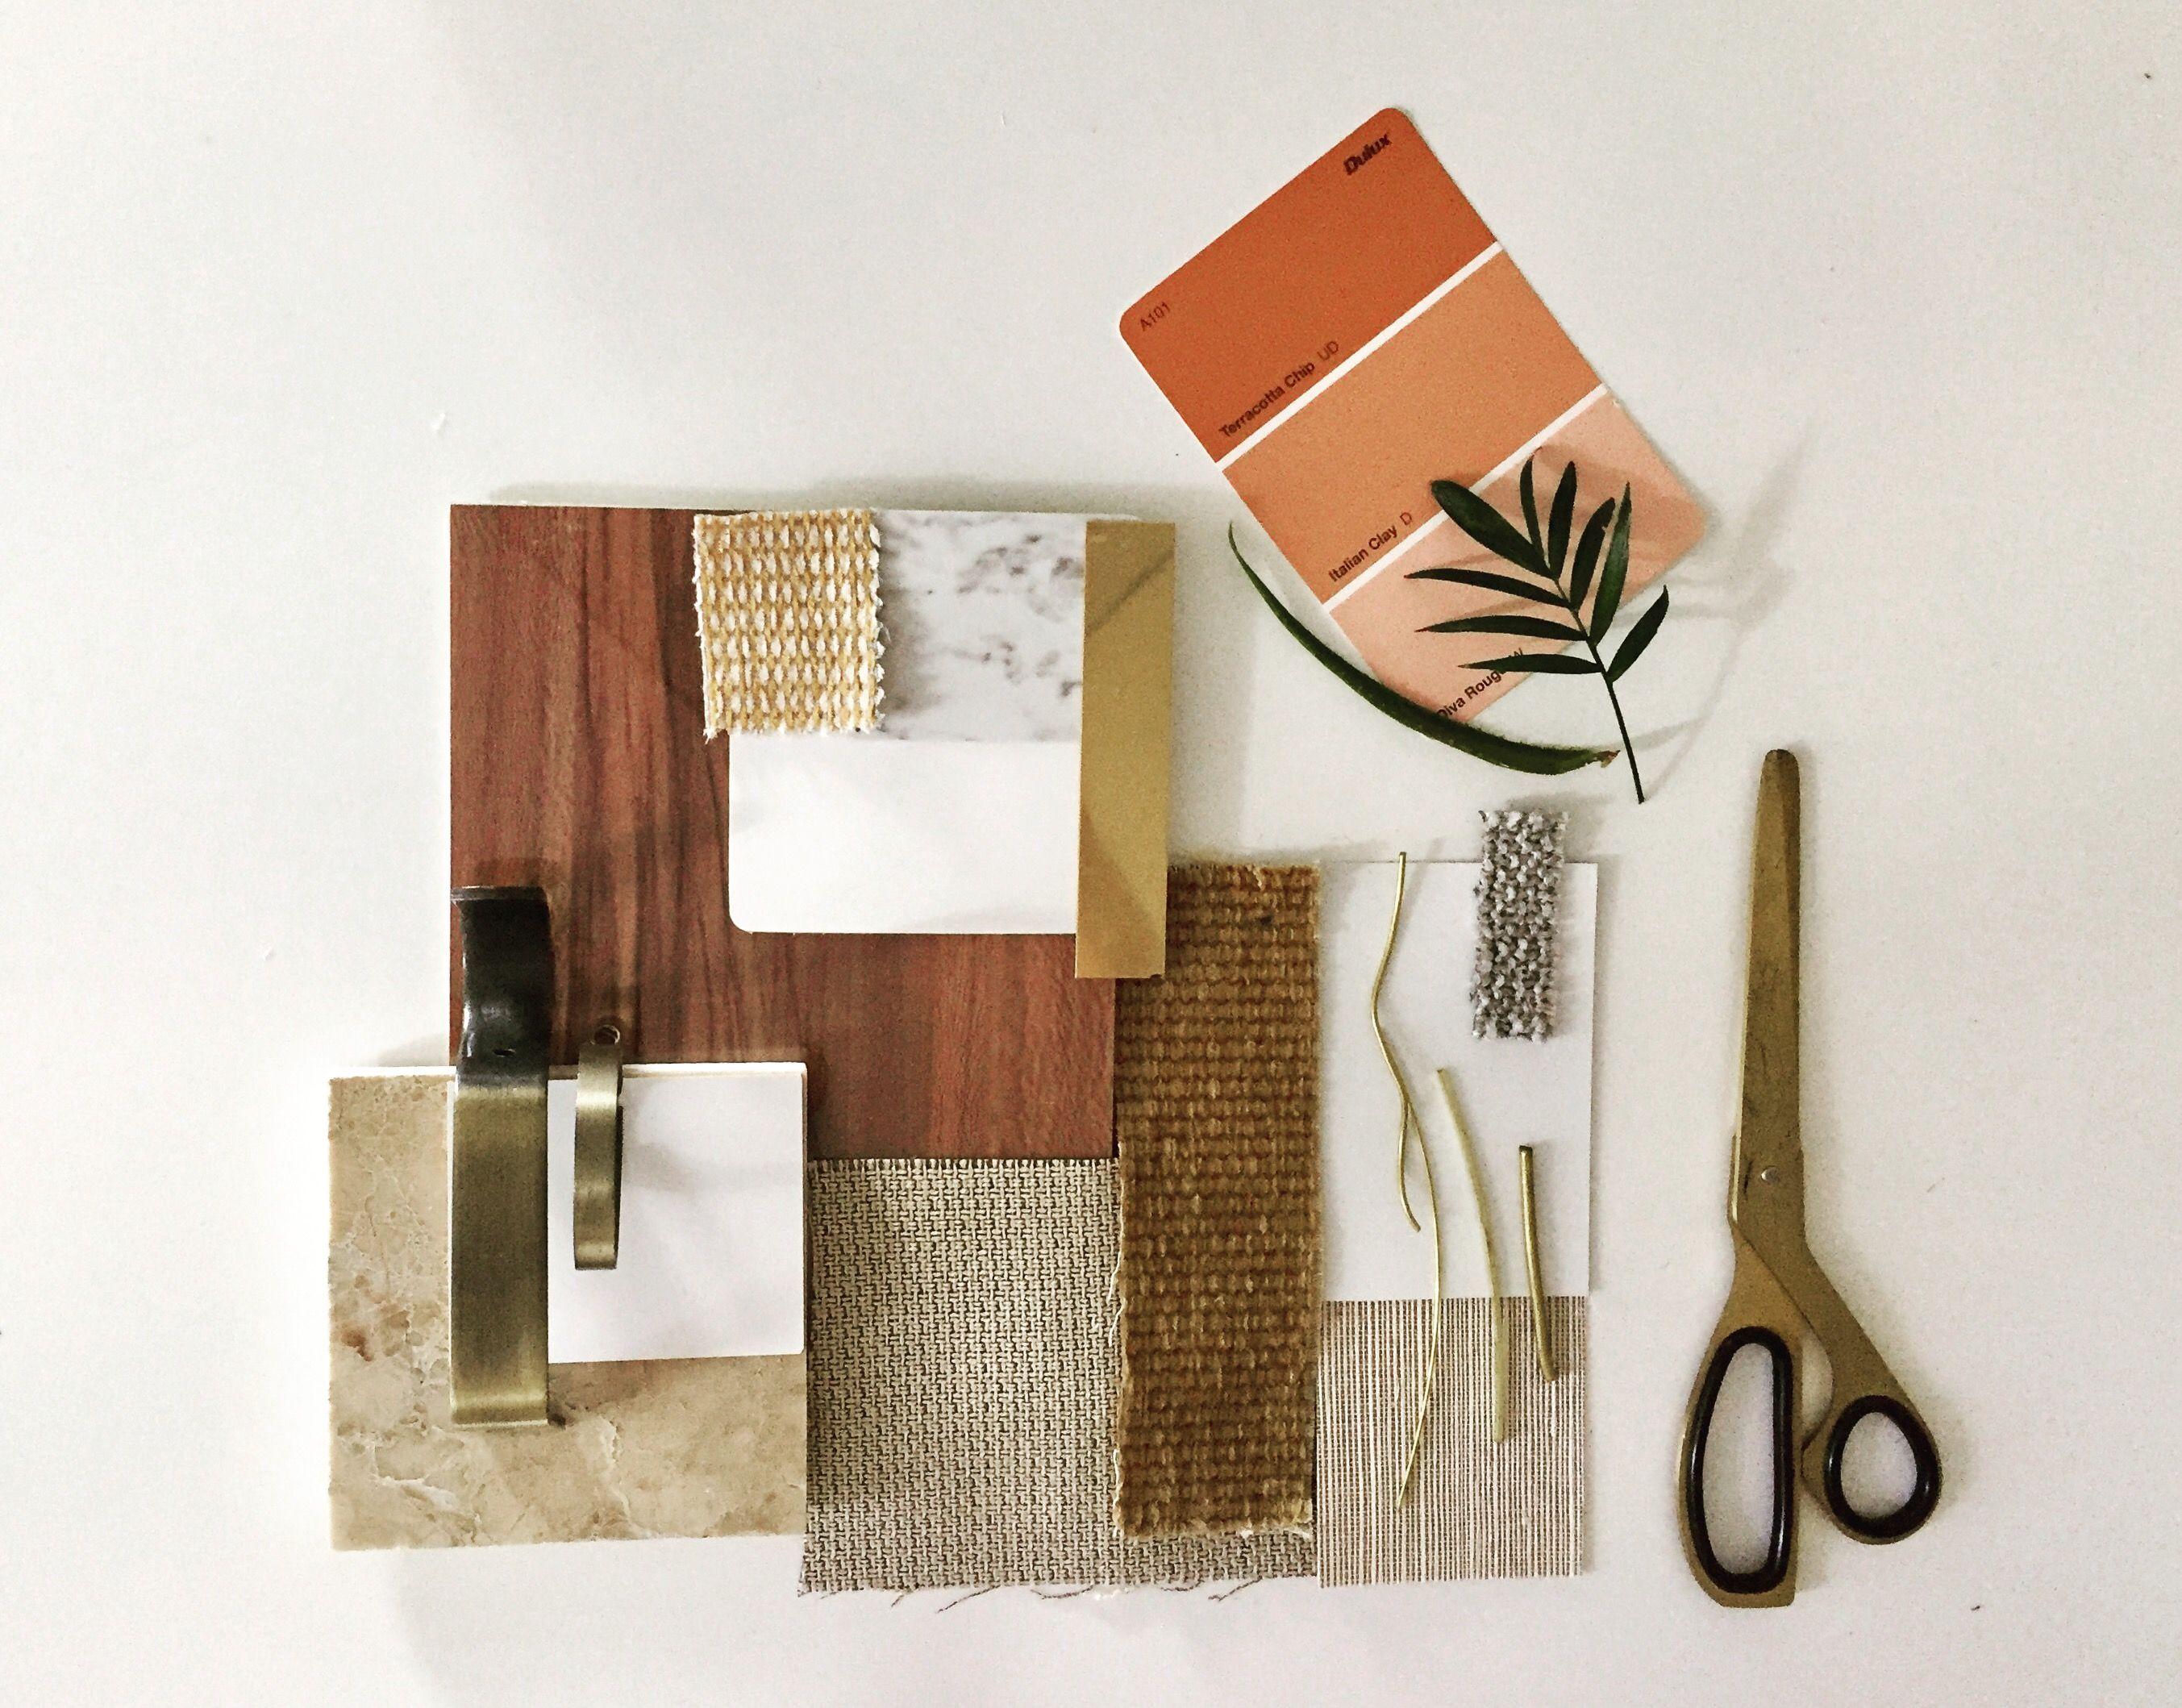 Interior design scheme by Sarah Bonett Interiors @sarahbonettinteriors